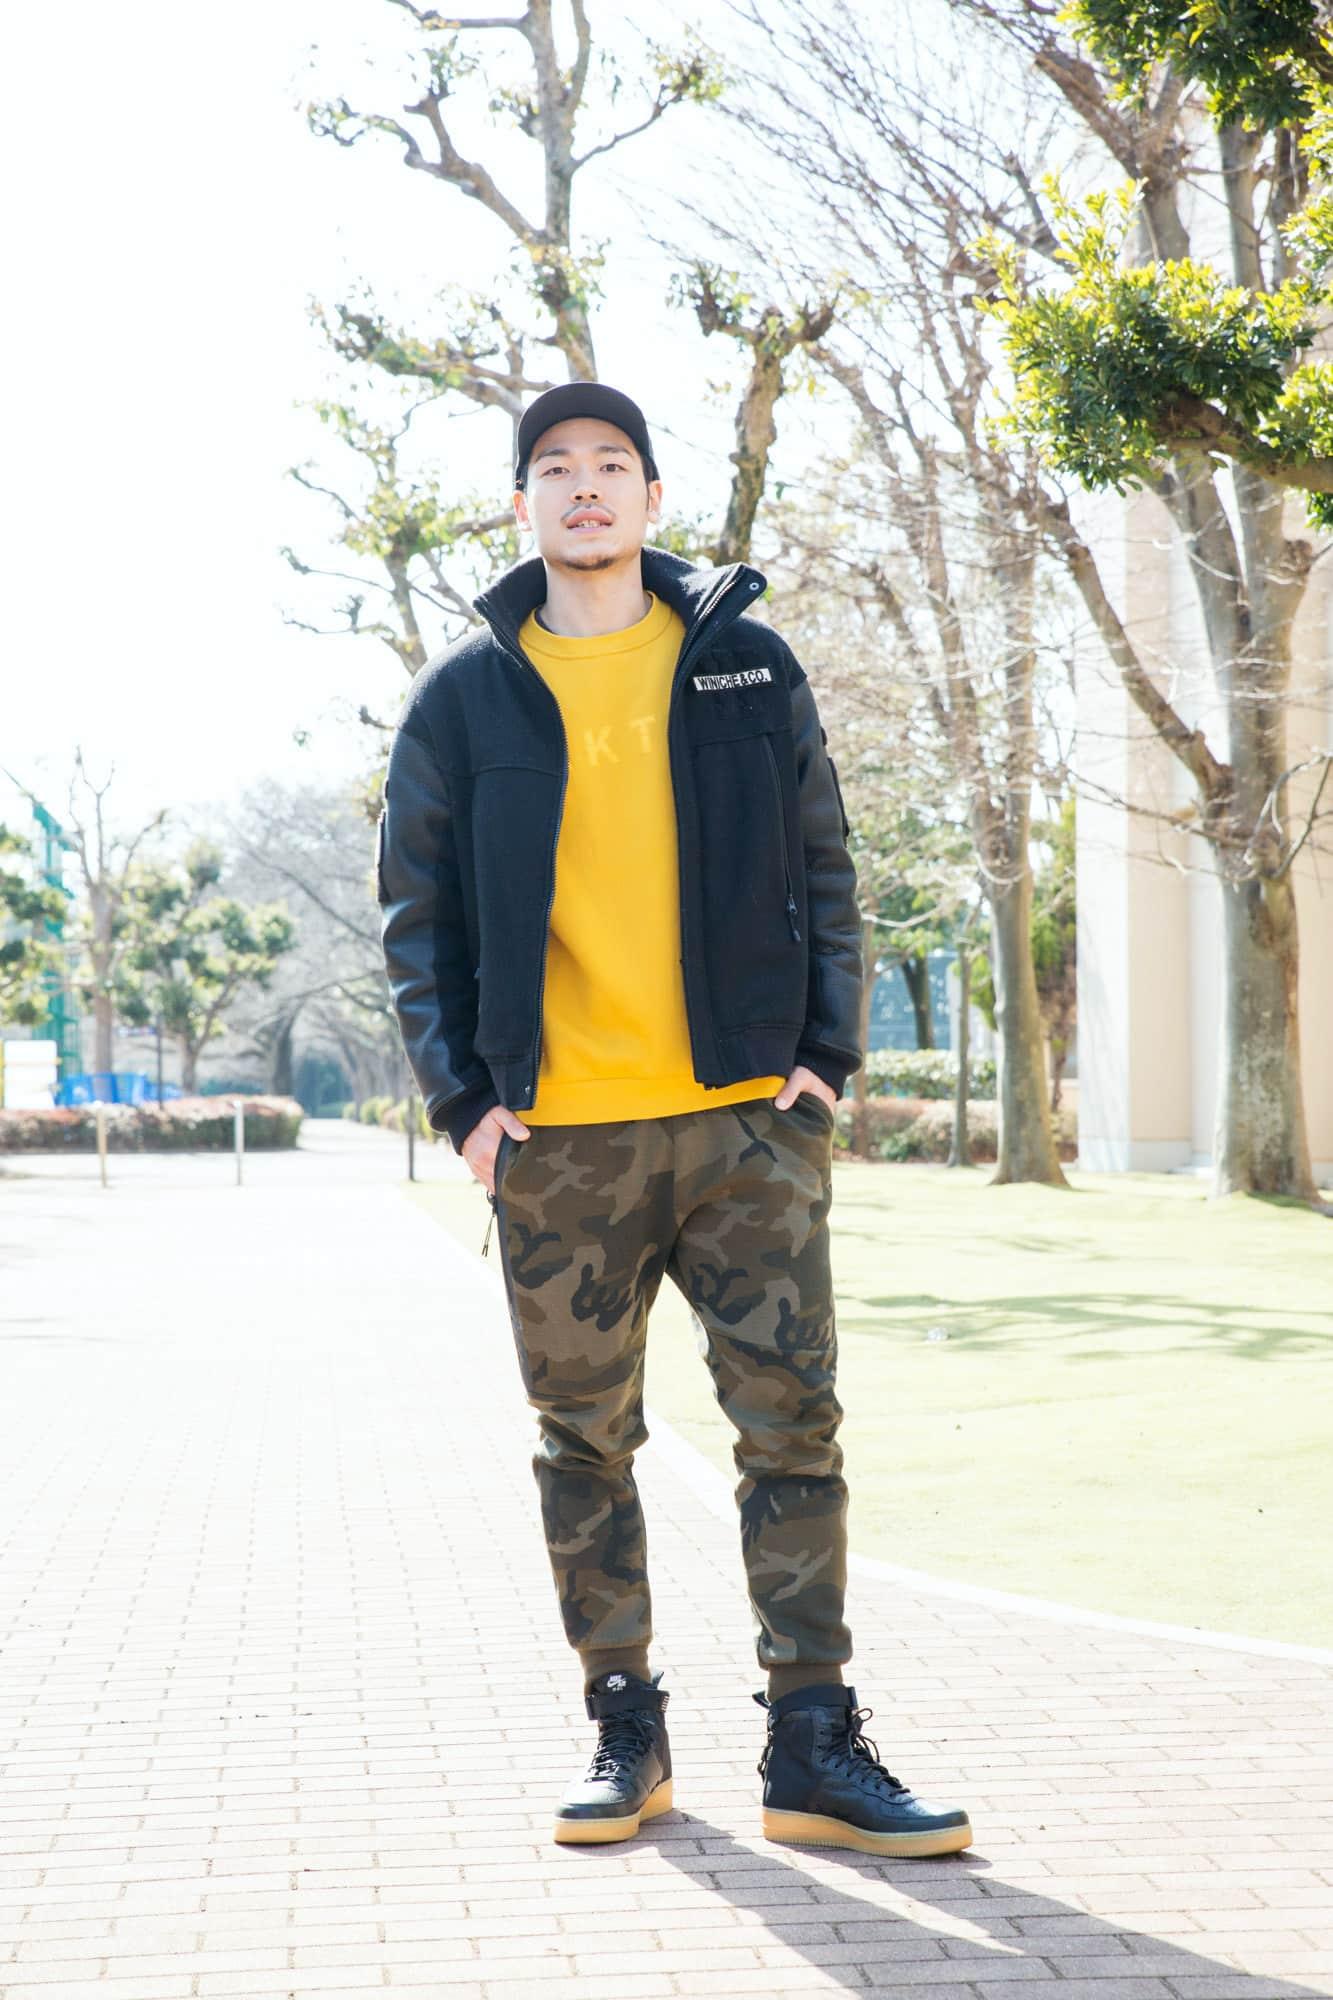 <Bリーグ×ファッションの密な関係 Vol.1>サンロッカーズ渋谷:長谷川智也選手のeasyスタイル